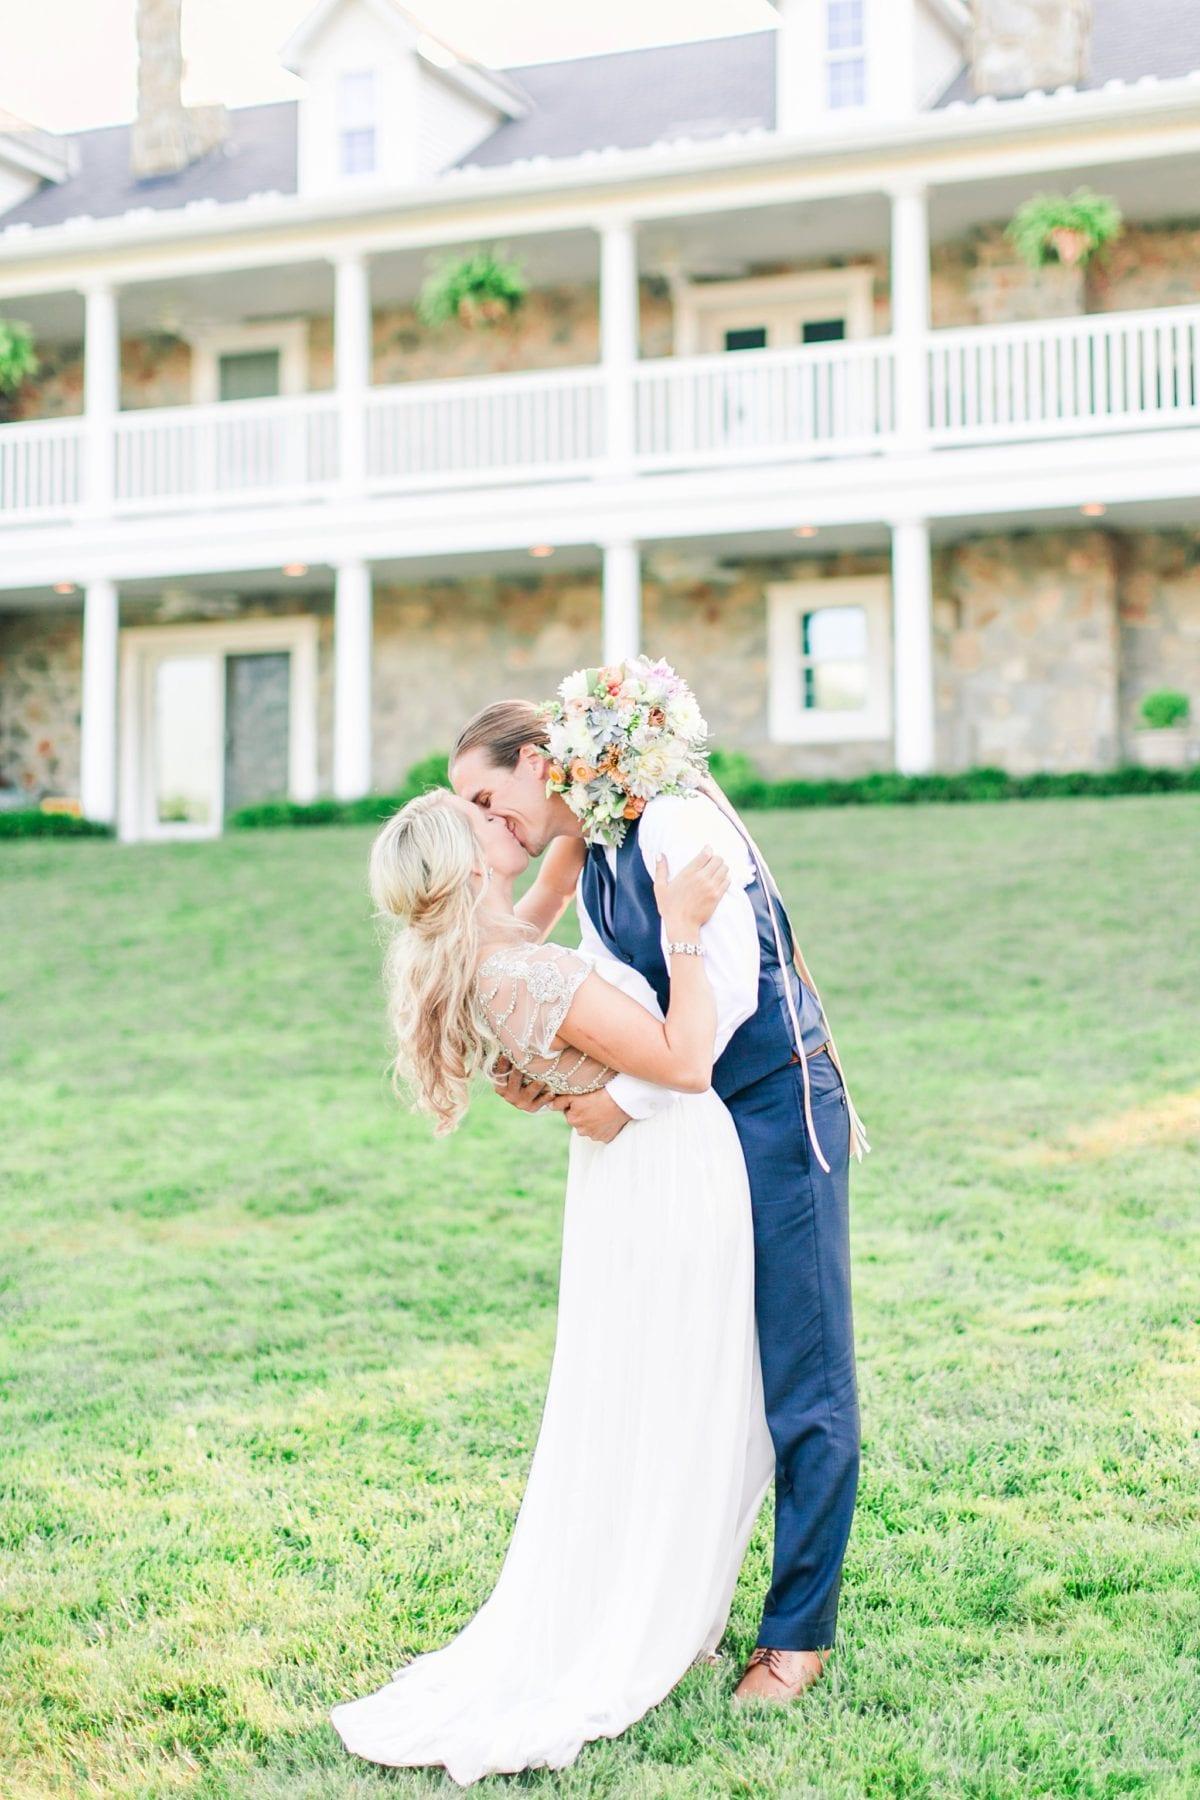 Pond View Farm Wedding Photos Maryland Wedding Photographer Kristen & Ryan Megan Kelsey Photography Blog-246.jpg